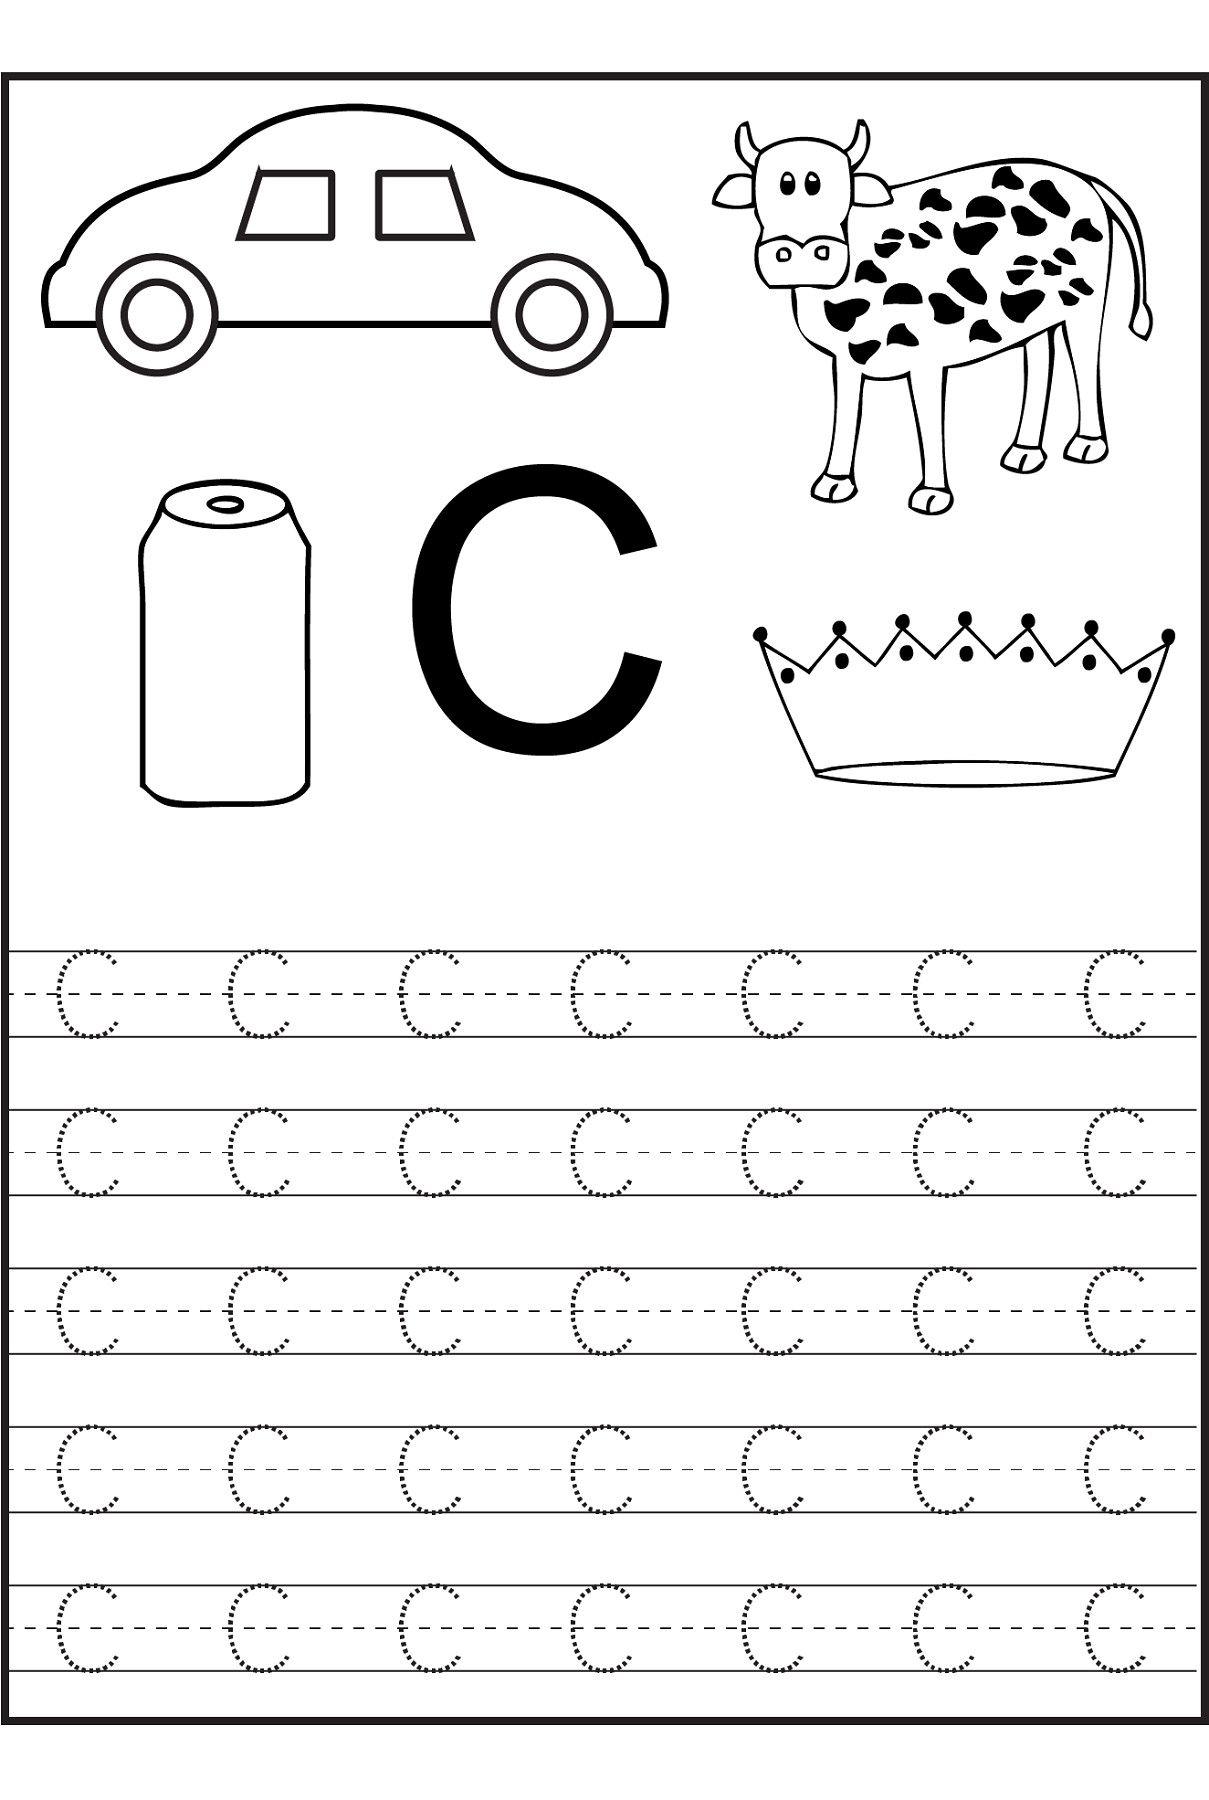 4 Letter Z Worksheet Traceable 001 In 2020 Learning Worksheets Preschool Worksheets Free Preschool Worksheets